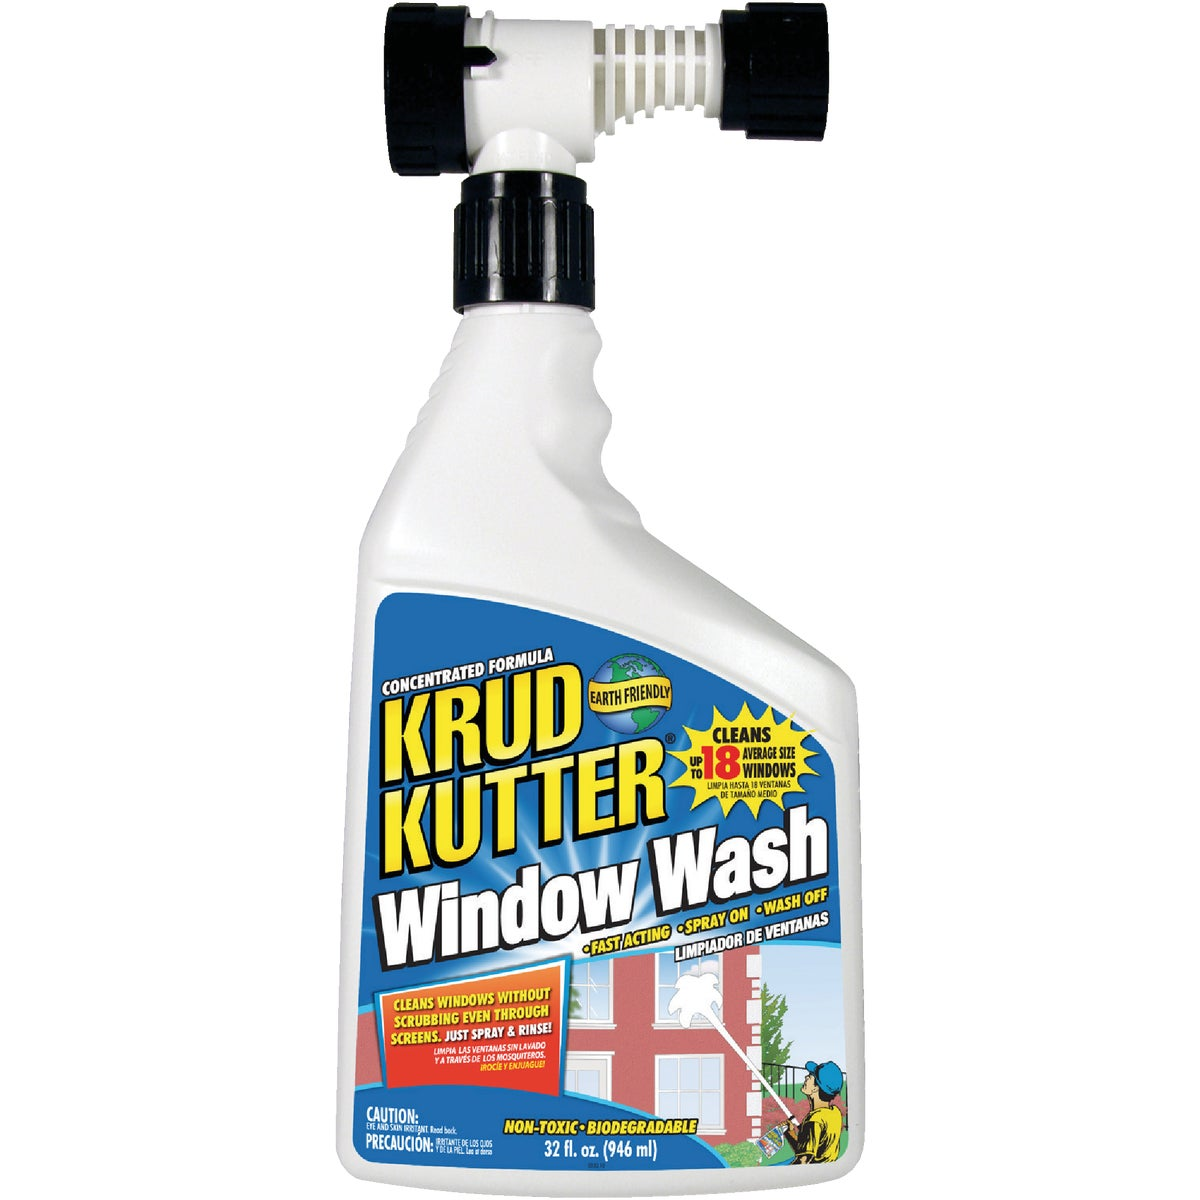 32Oz Windw/Outdr Cleaner